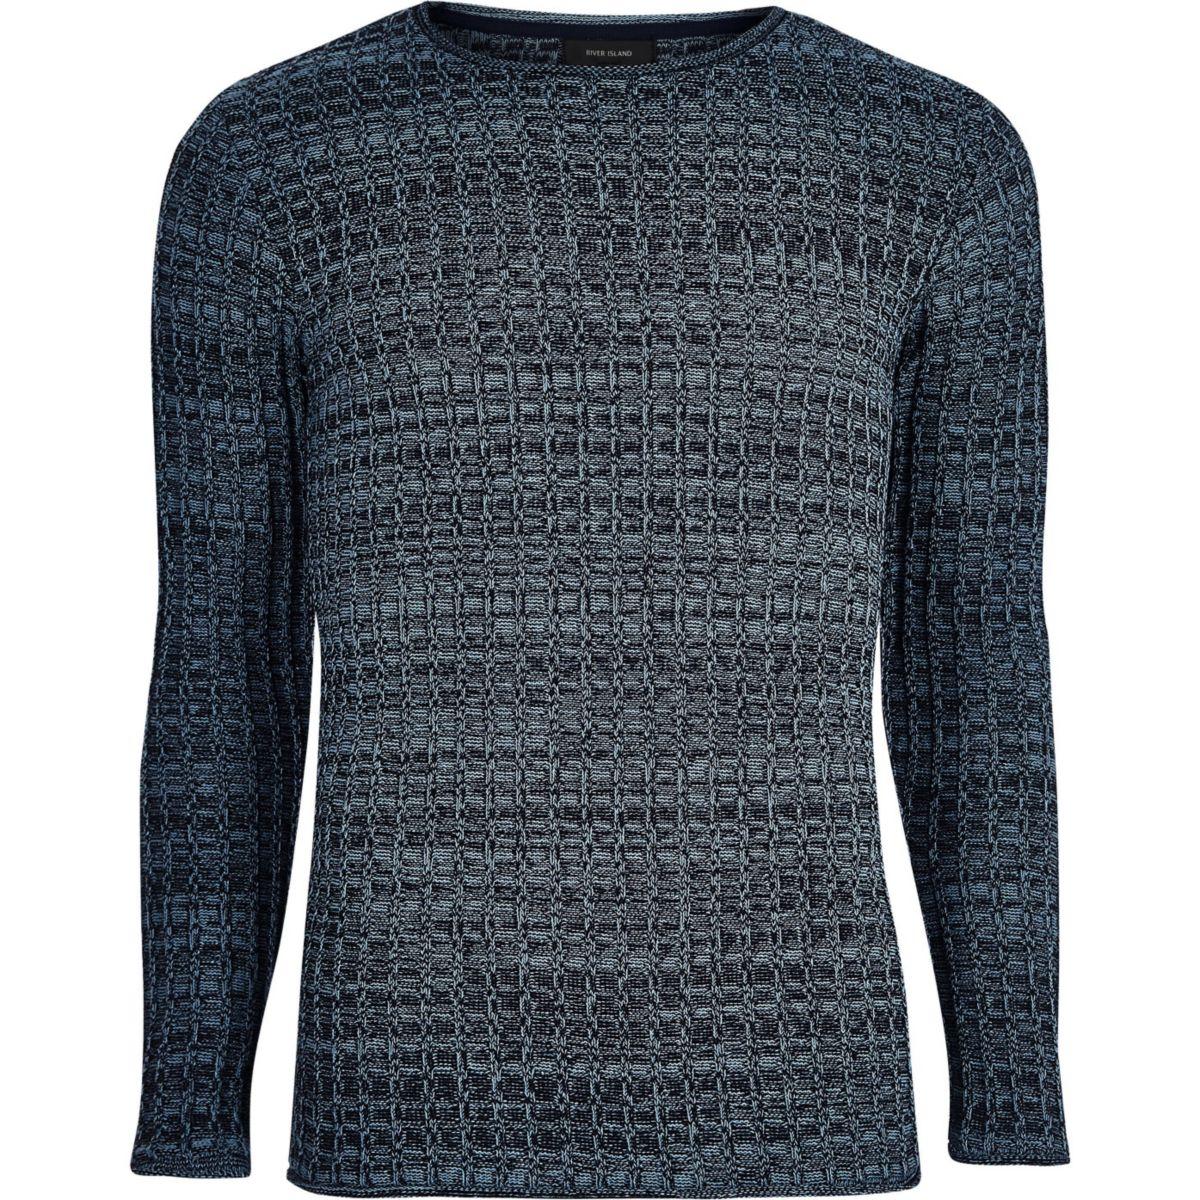 Blue ribbed crew neck knit jumper